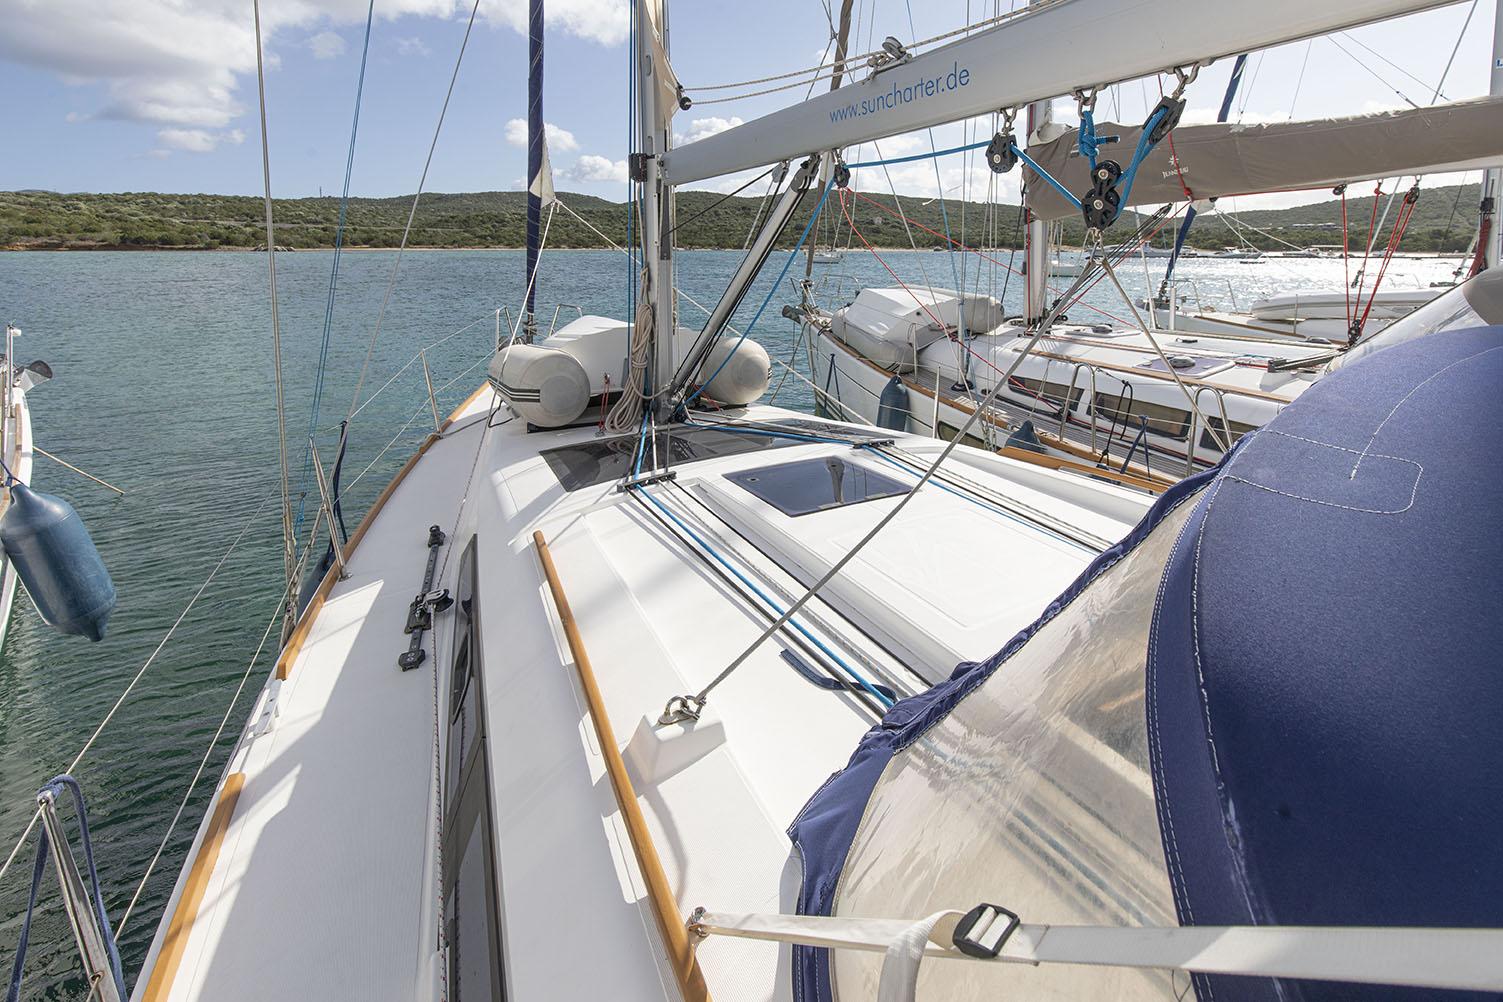 Dufour 382 Silce of the Sea Sun Charter